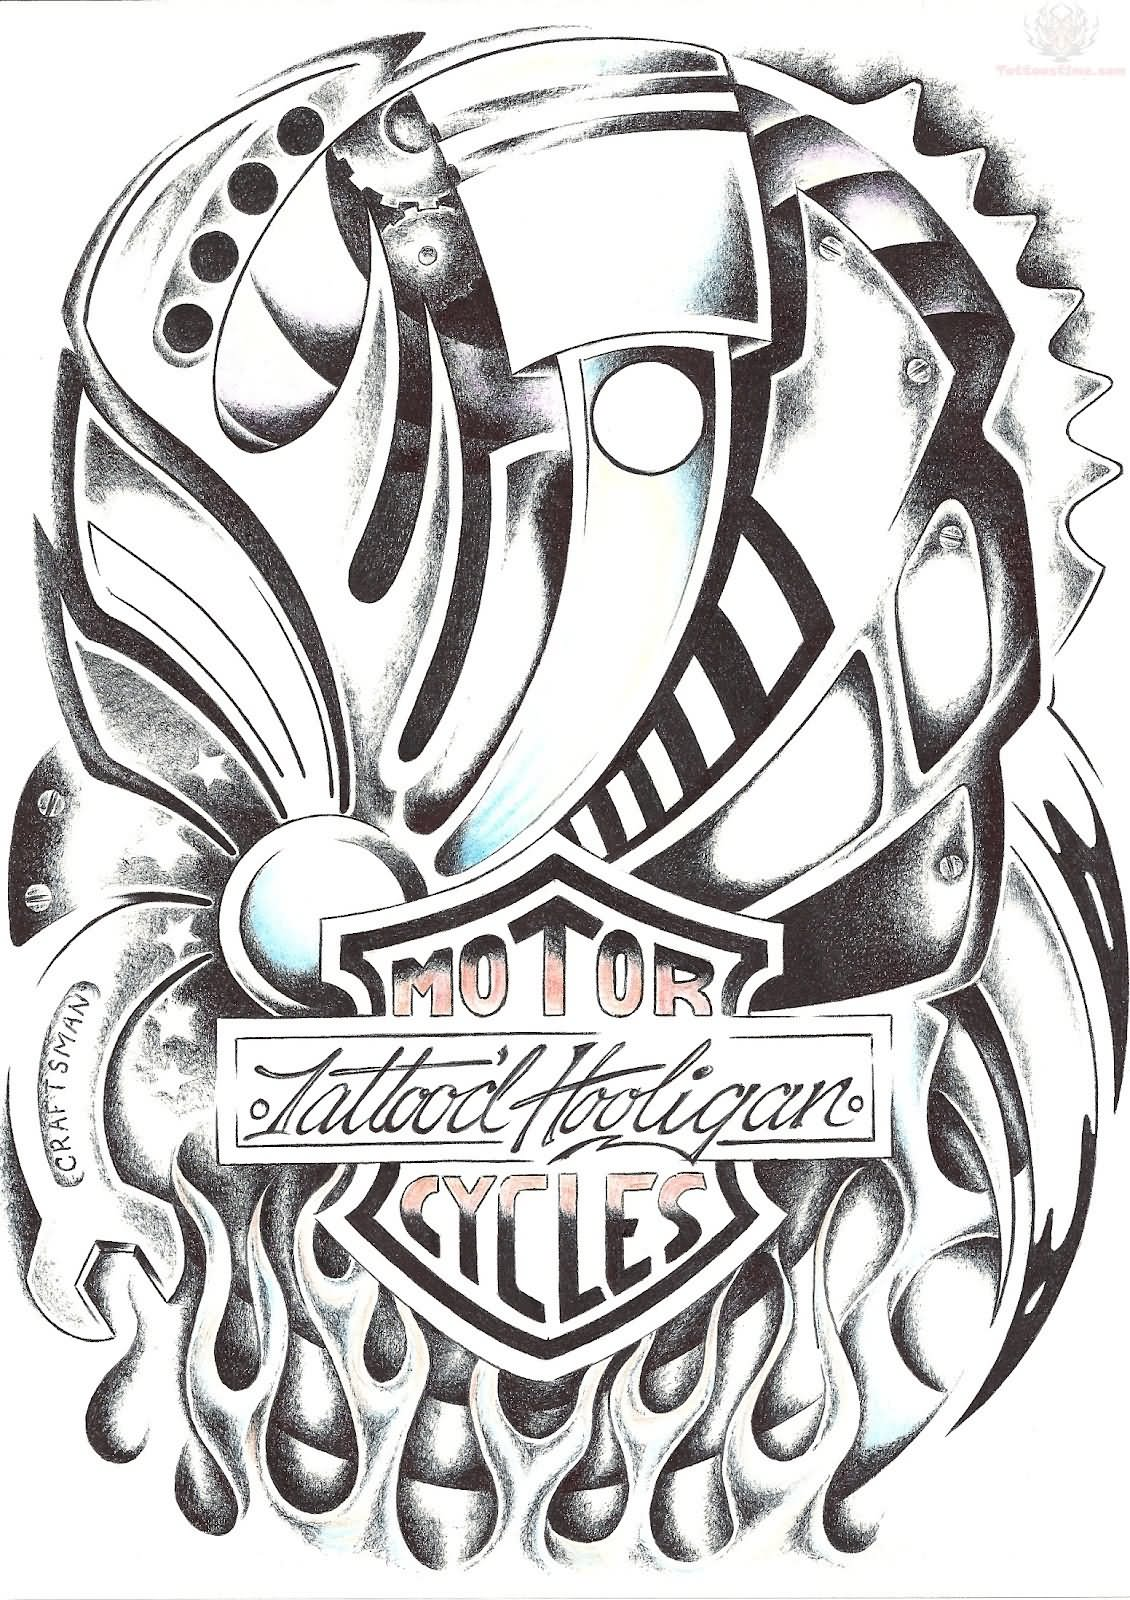 Harley Davidson Tattoo Images Amp Designs